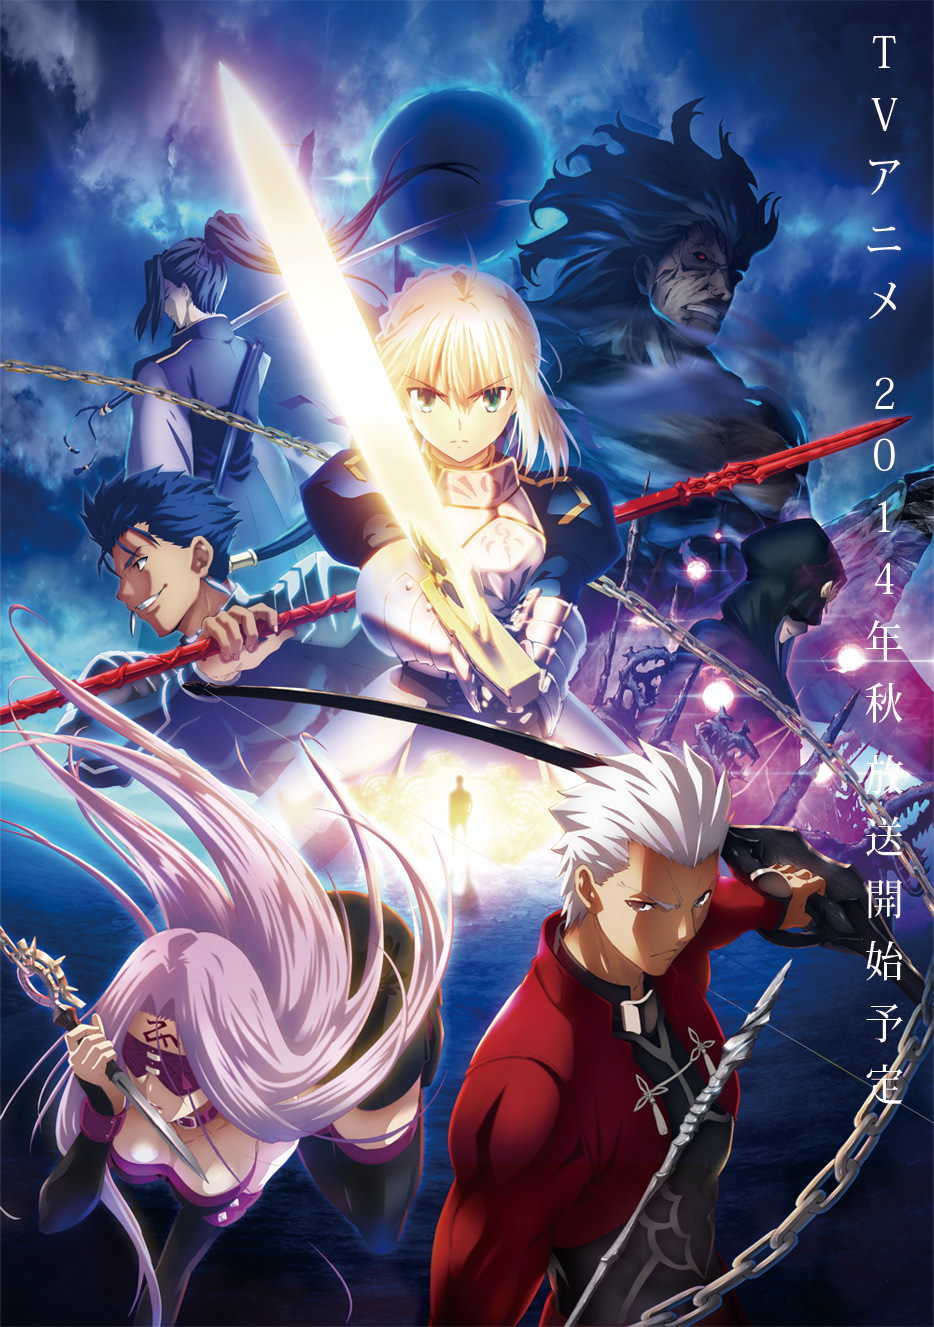 Судьба: Ночь Схватки 2 сезон / Fate/Stay Night Unlimited Blade Works